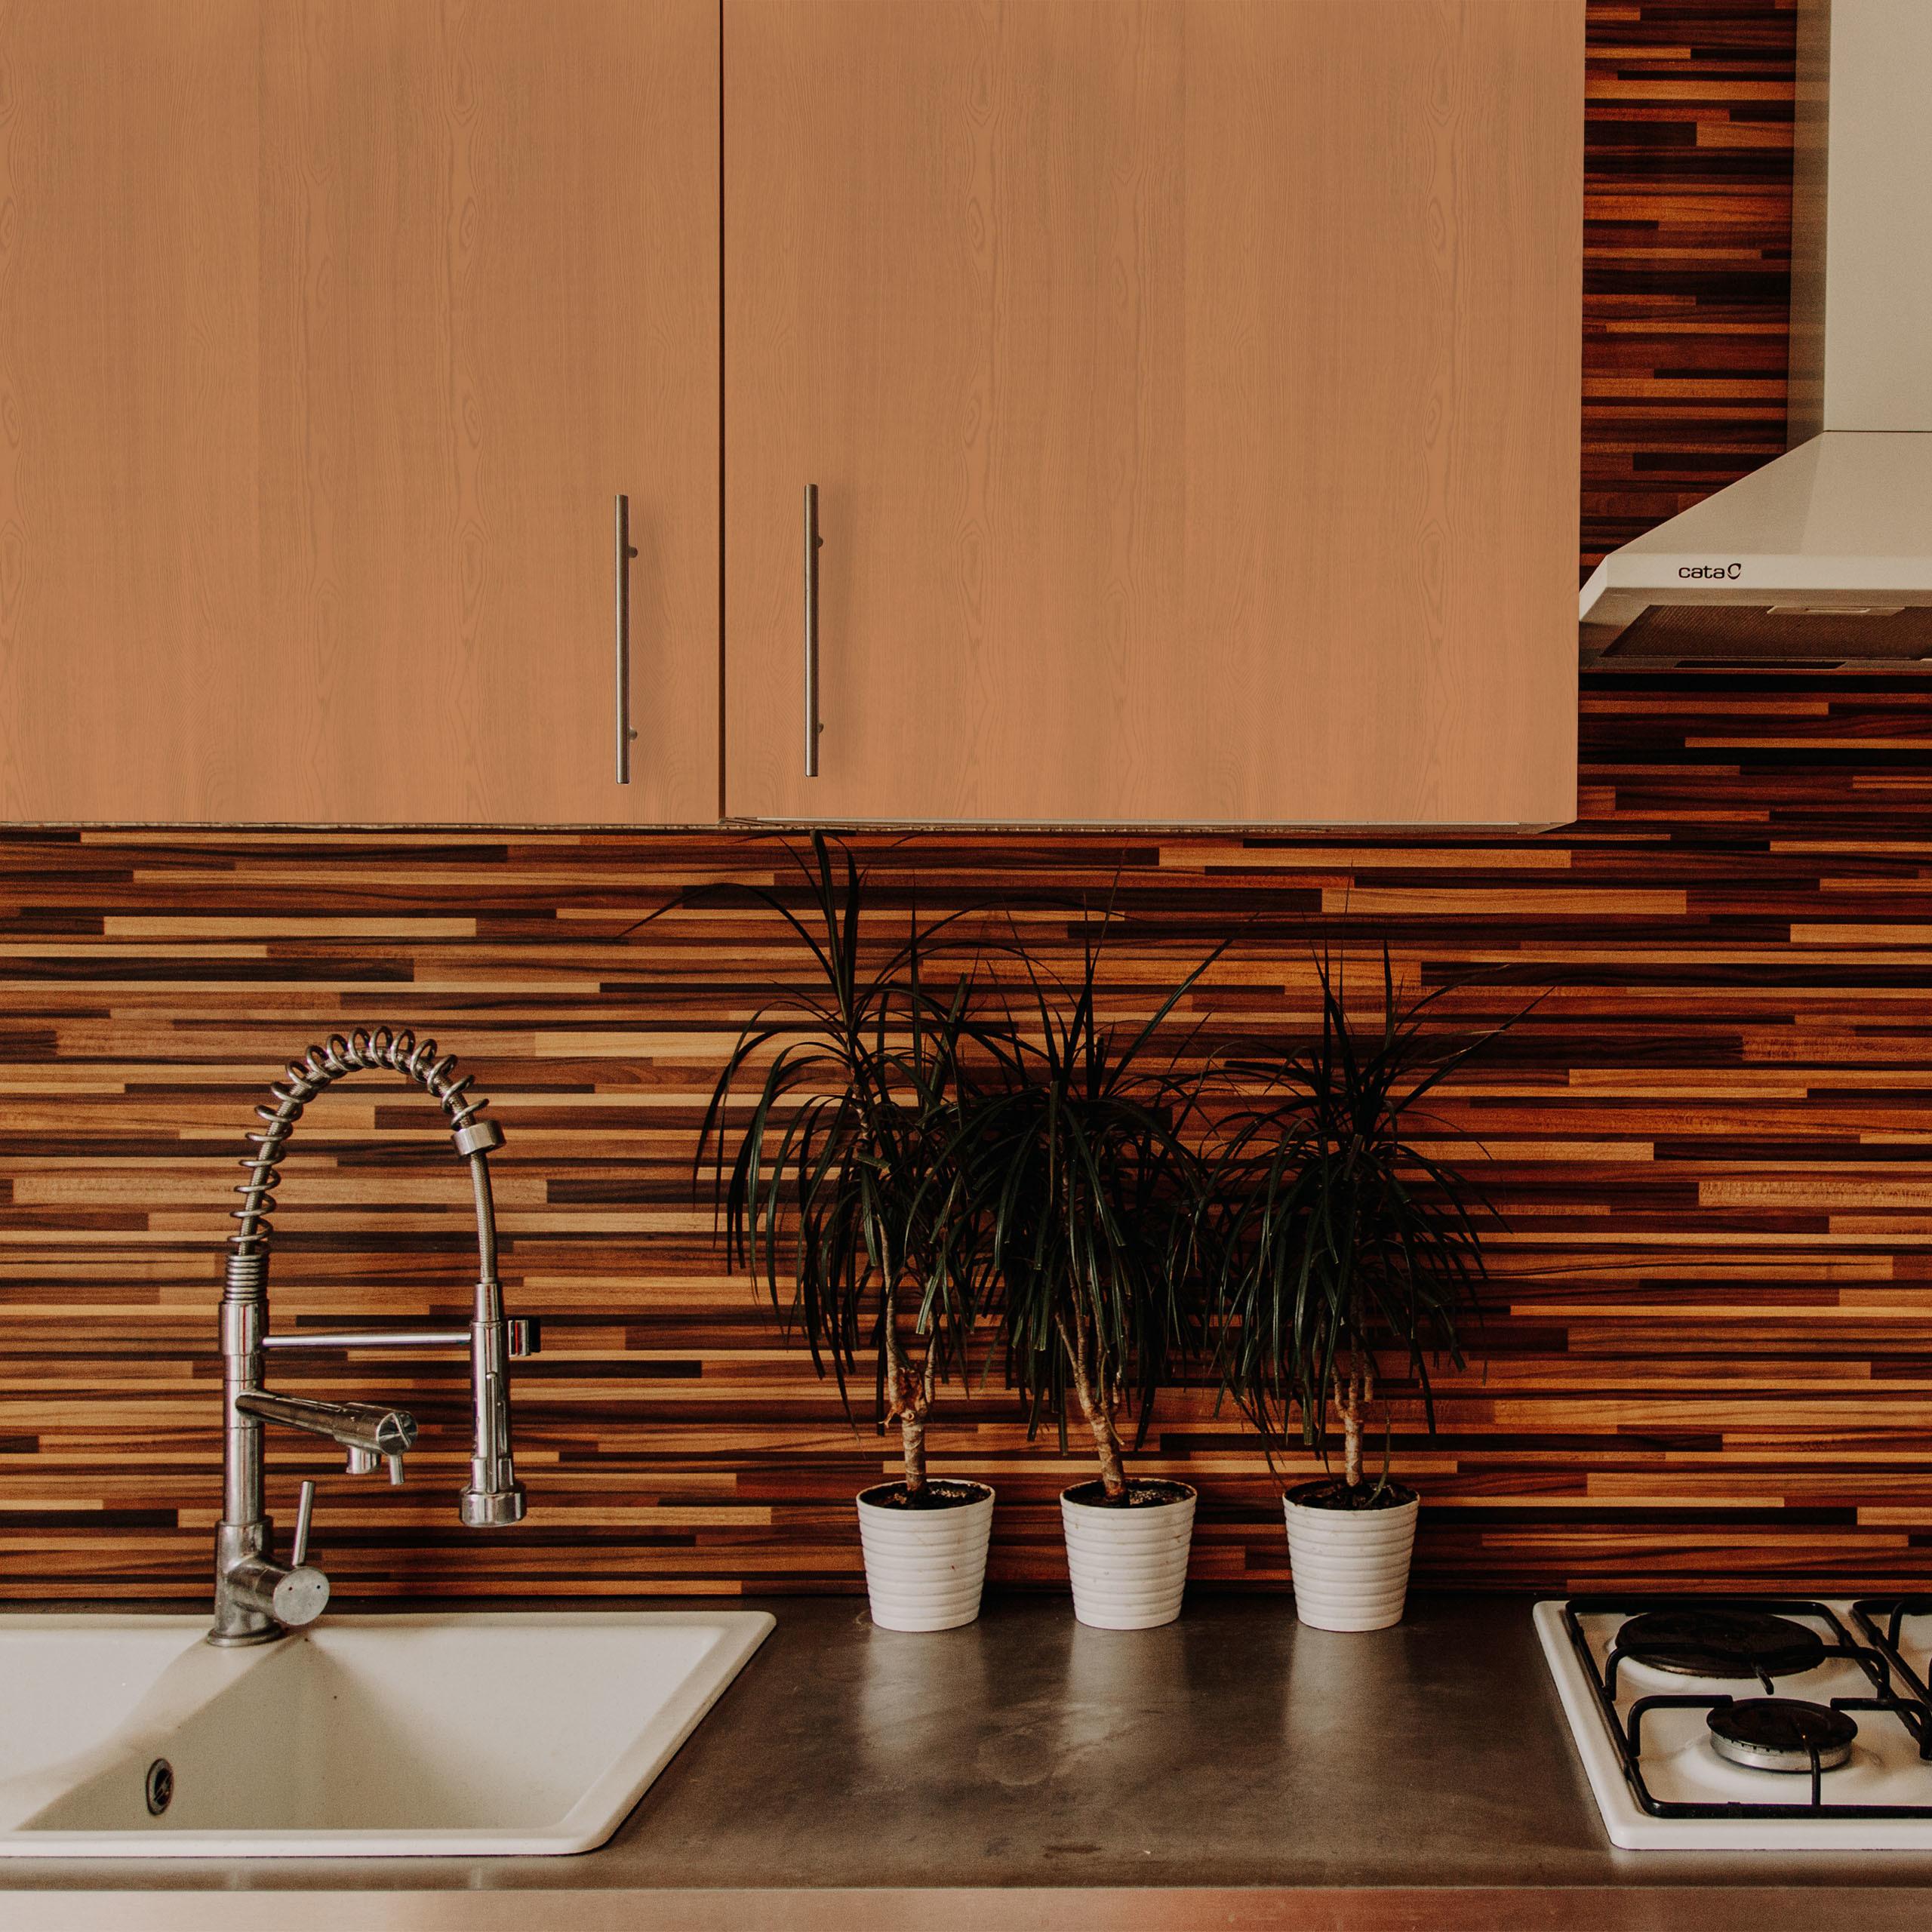 5 x Klebefolie Möbel Dekofolie Holzoptik braun Holzfolie 200 cm selbstklebend